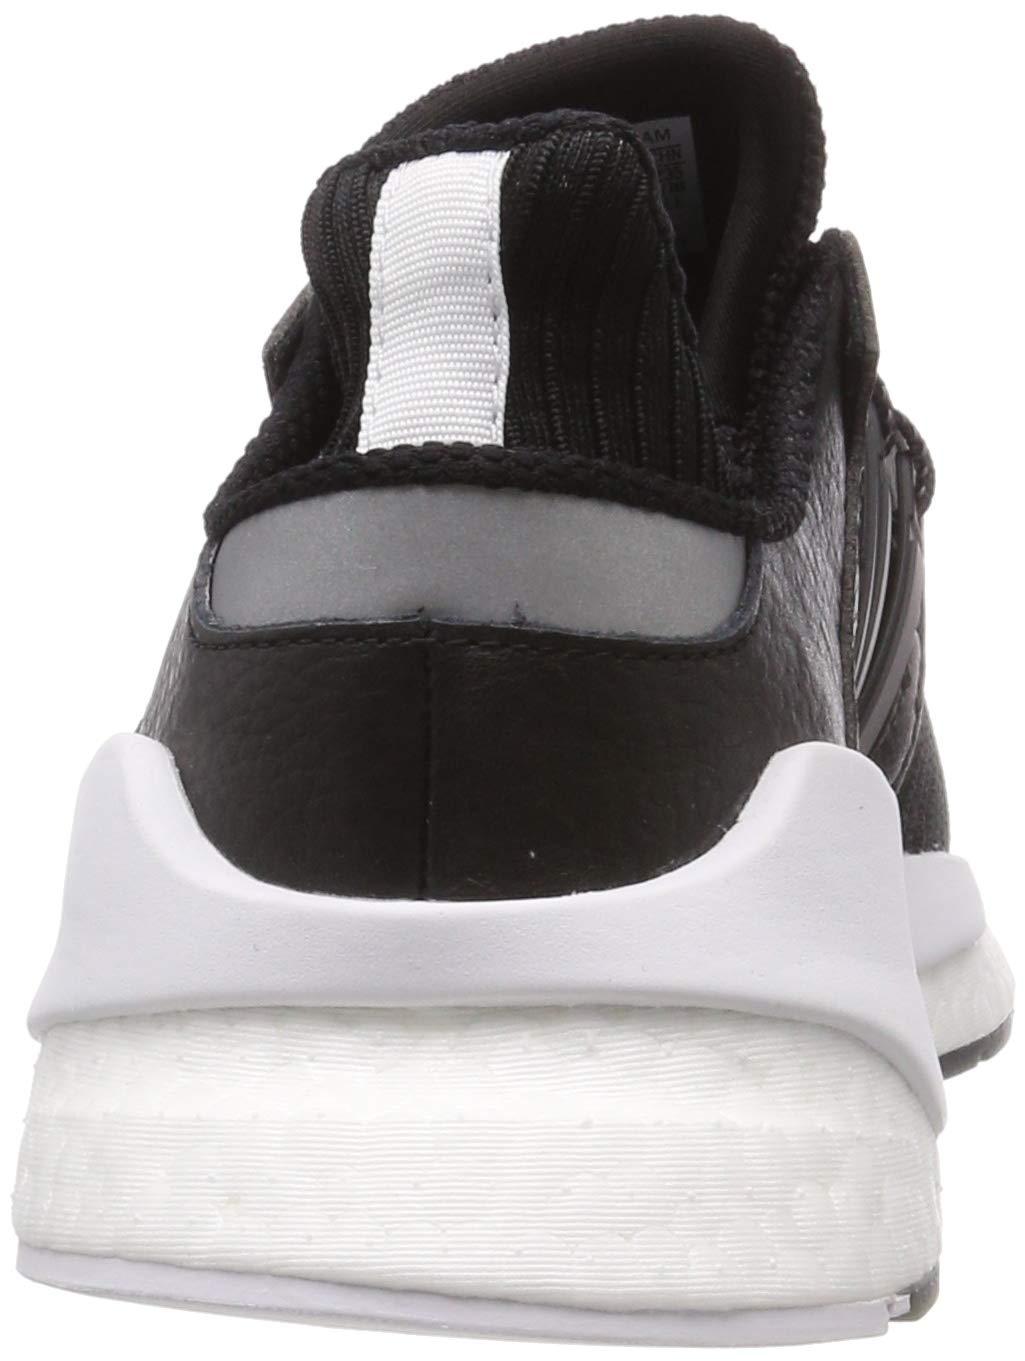 adidas EQT Support 91/18, Scarpe da Fitness Uomo 2 spesavip